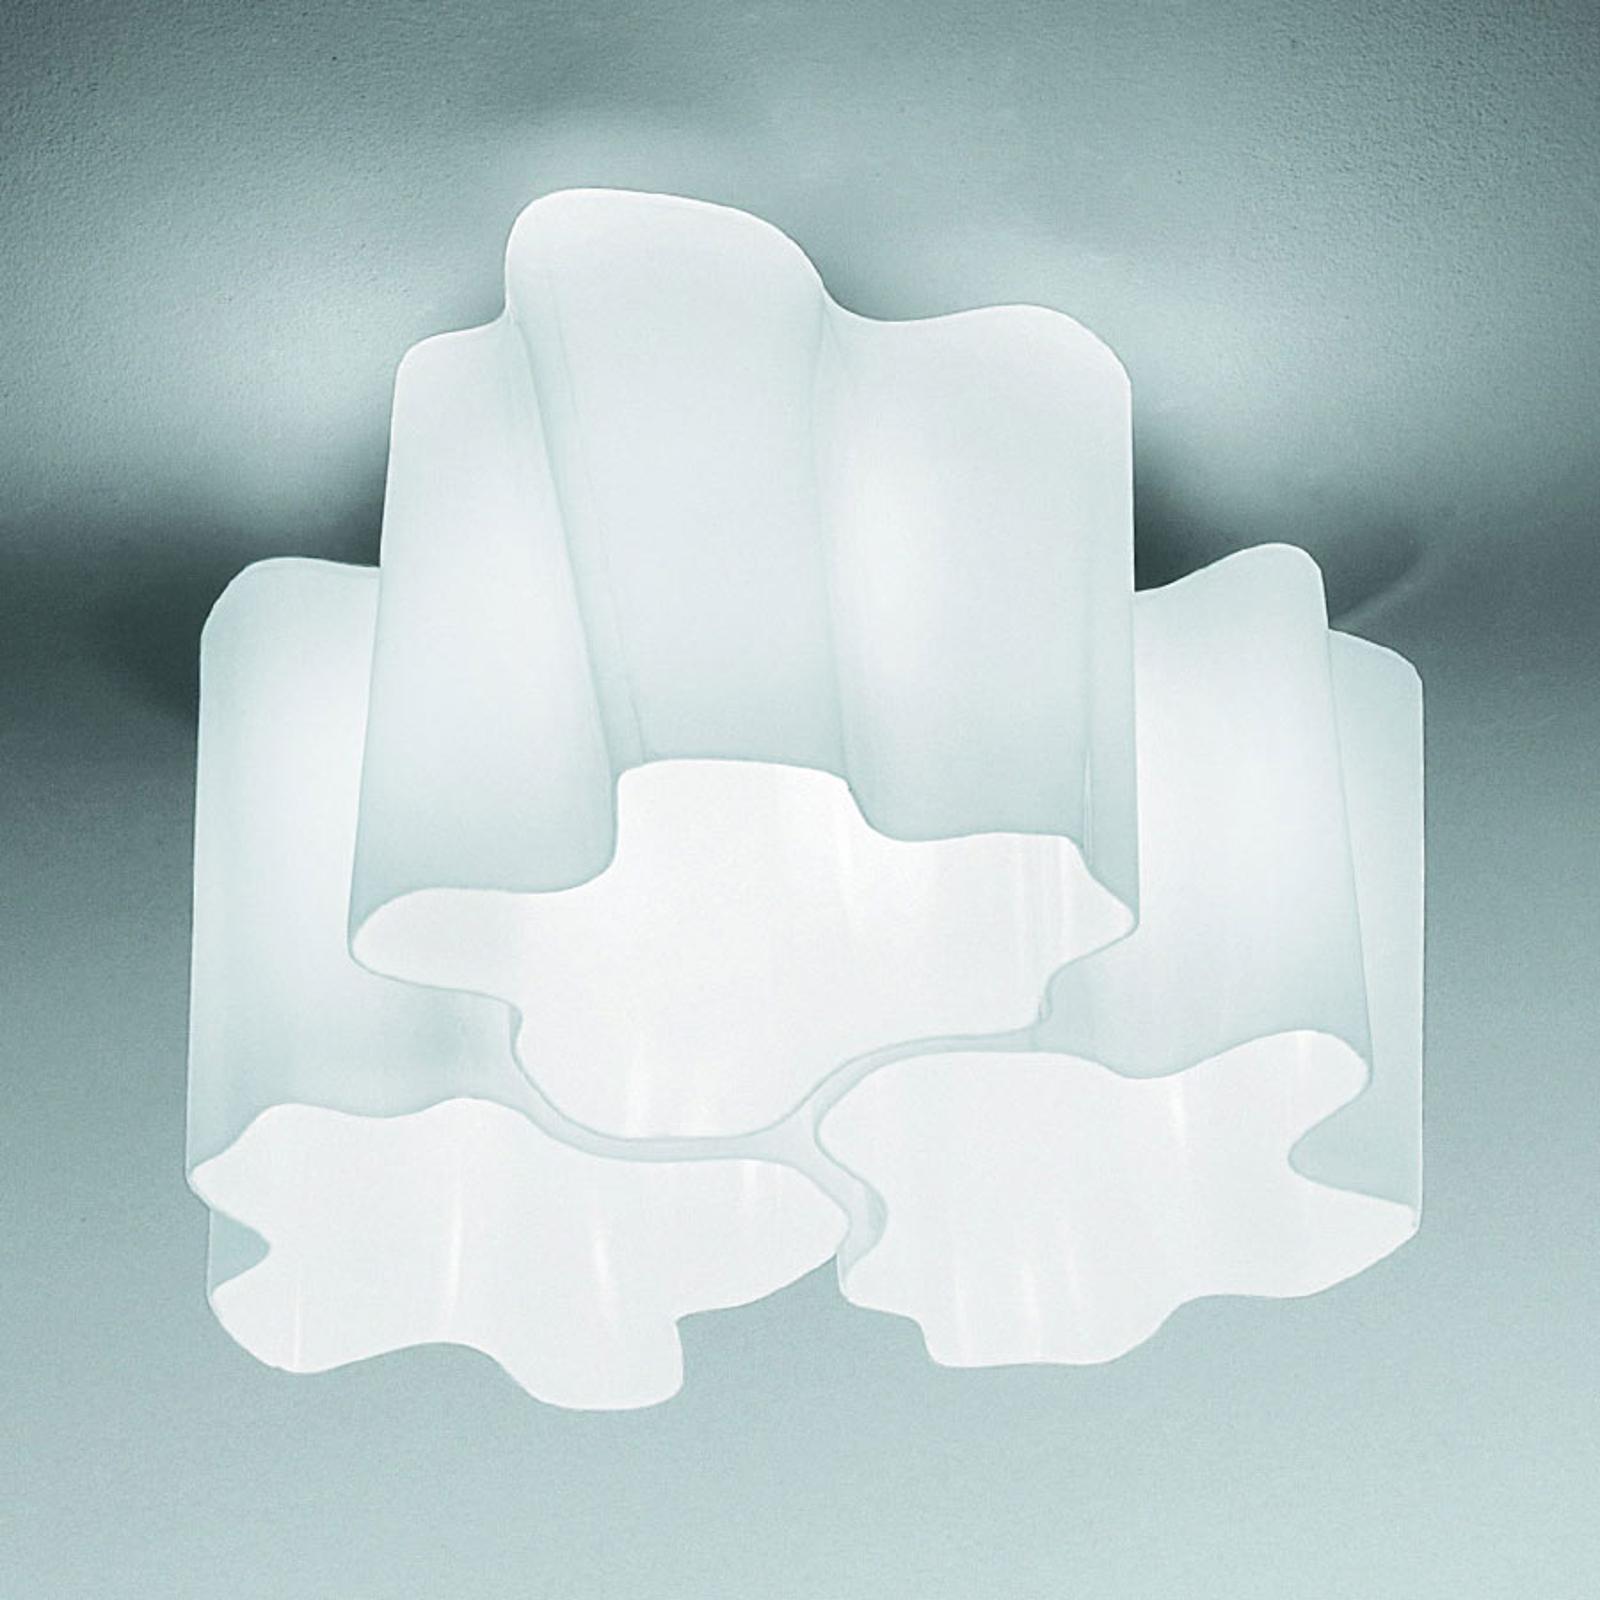 Artemide Logico lampa sufitowa 3-pkt. 120° 33x33cm